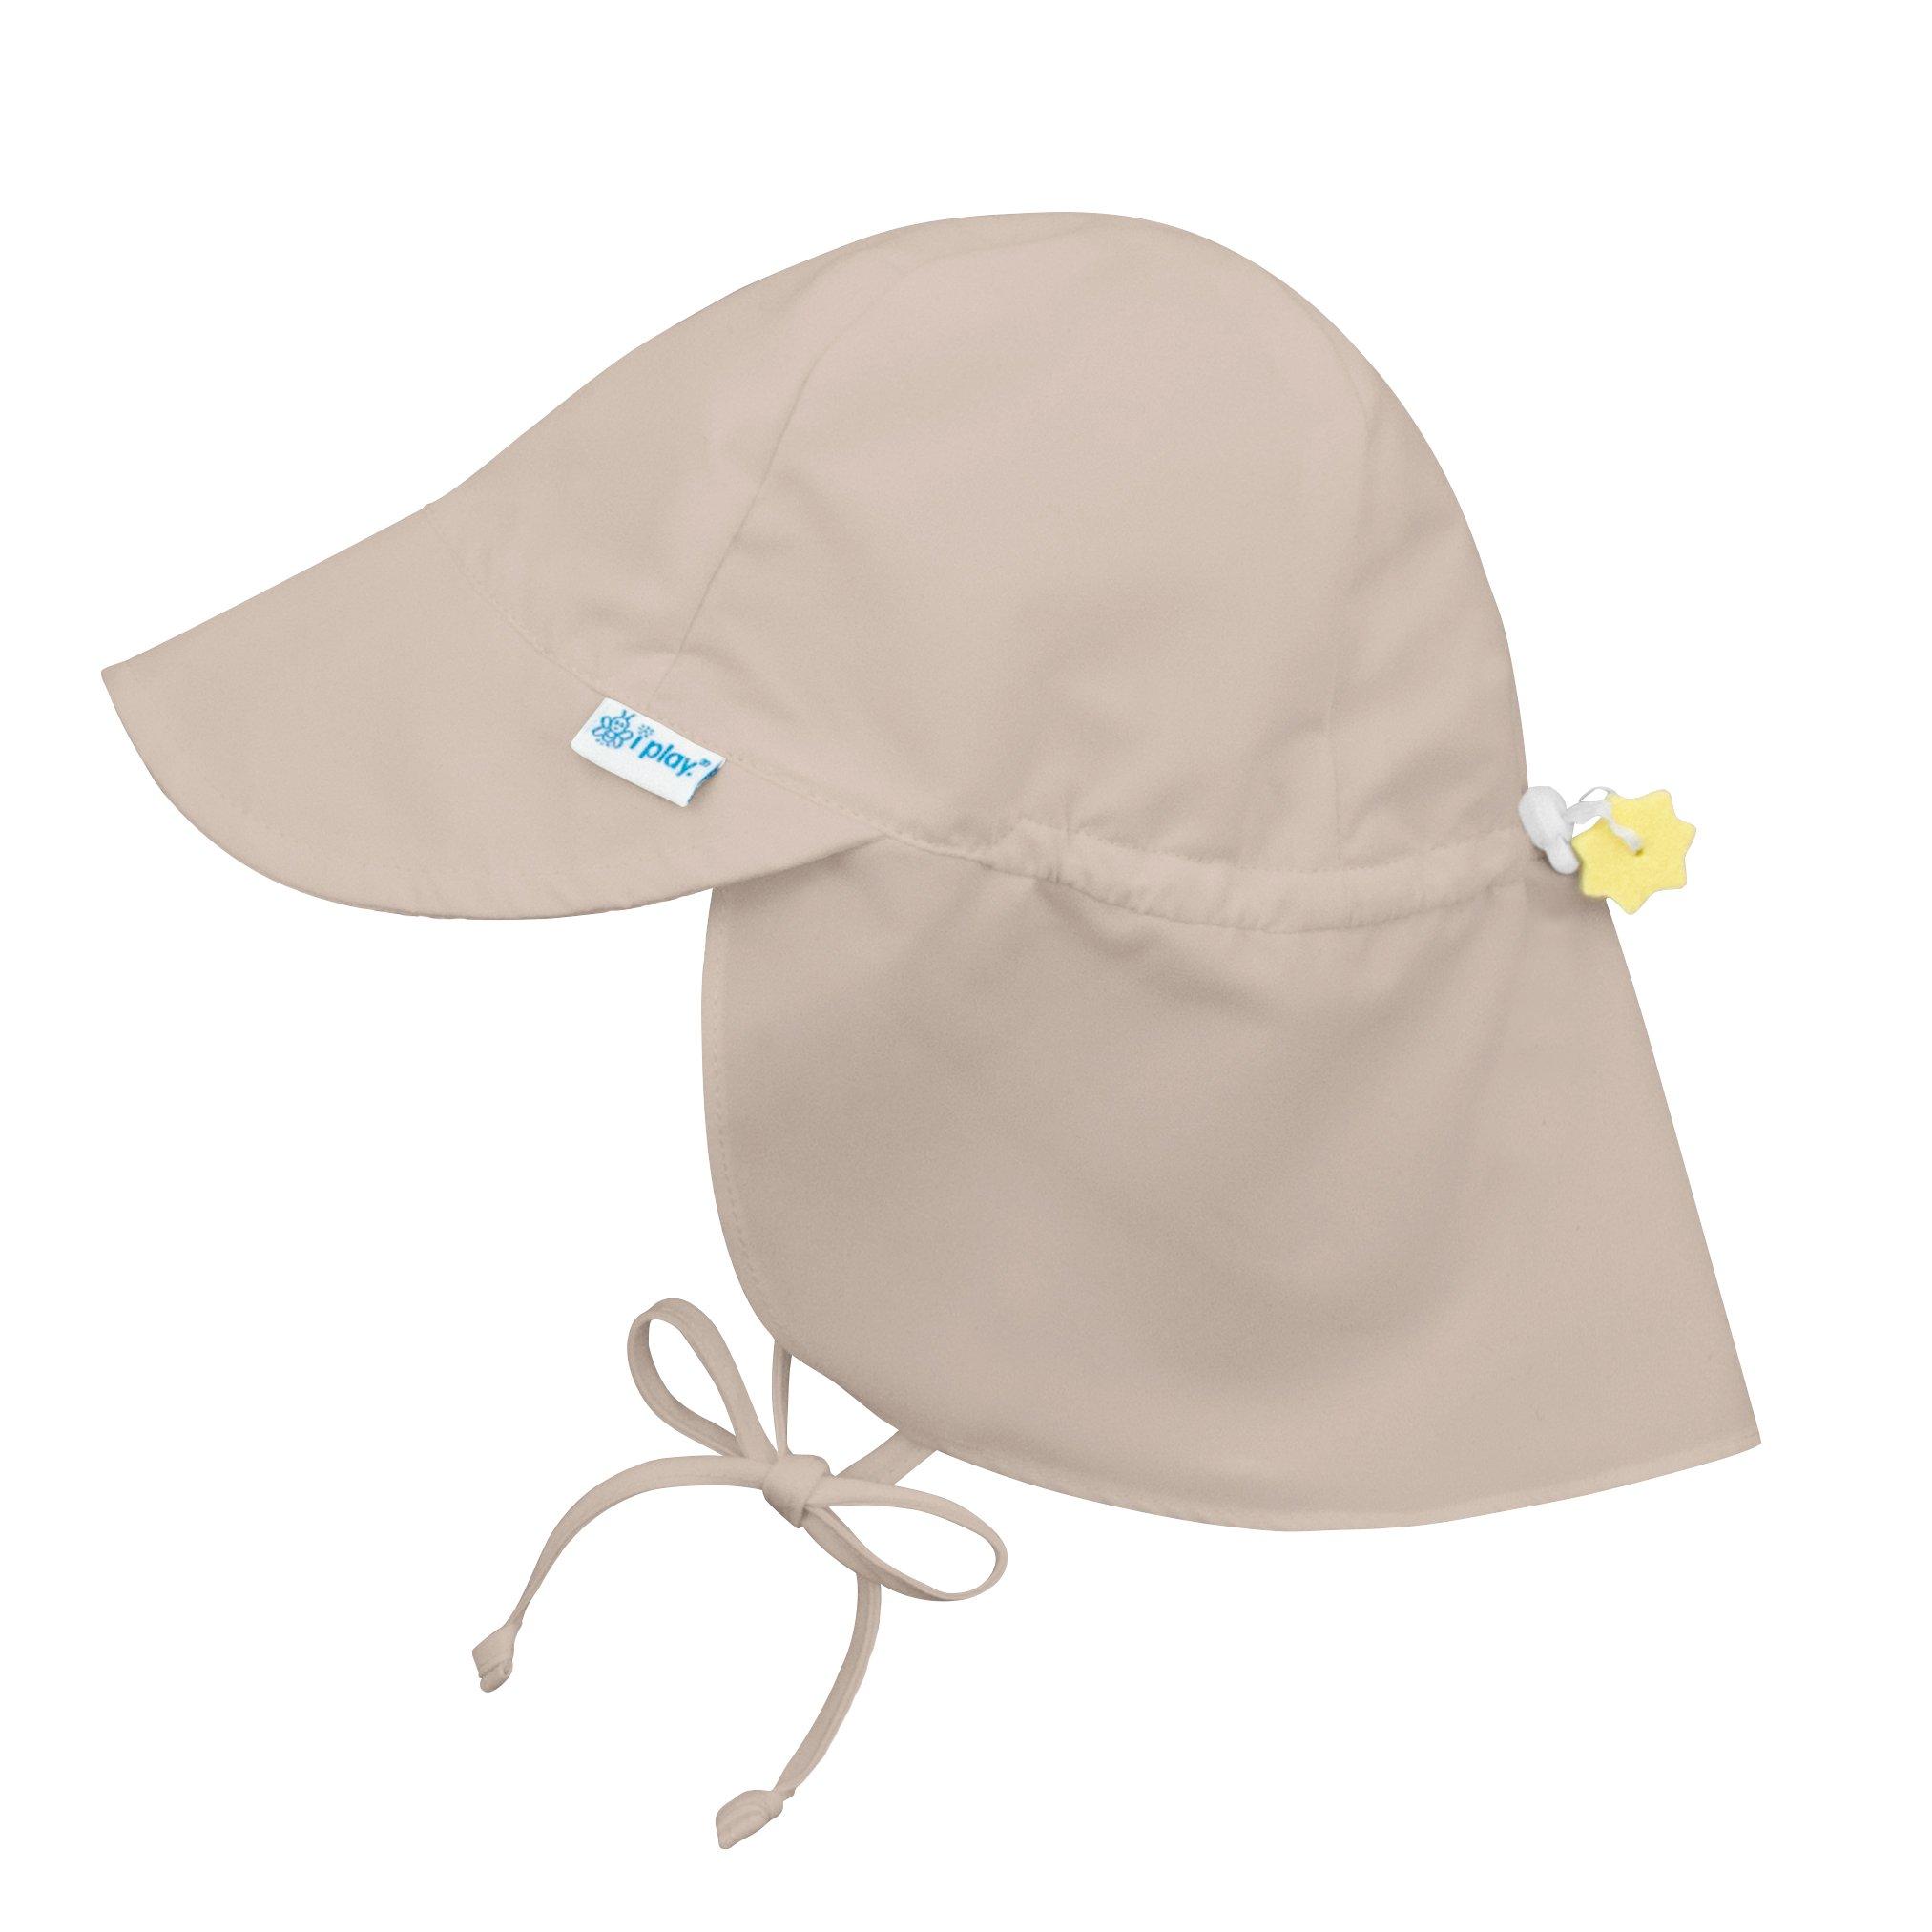 i play. Toddler Flap Sun Protection Swim Hat, Khaki, 2T-4T